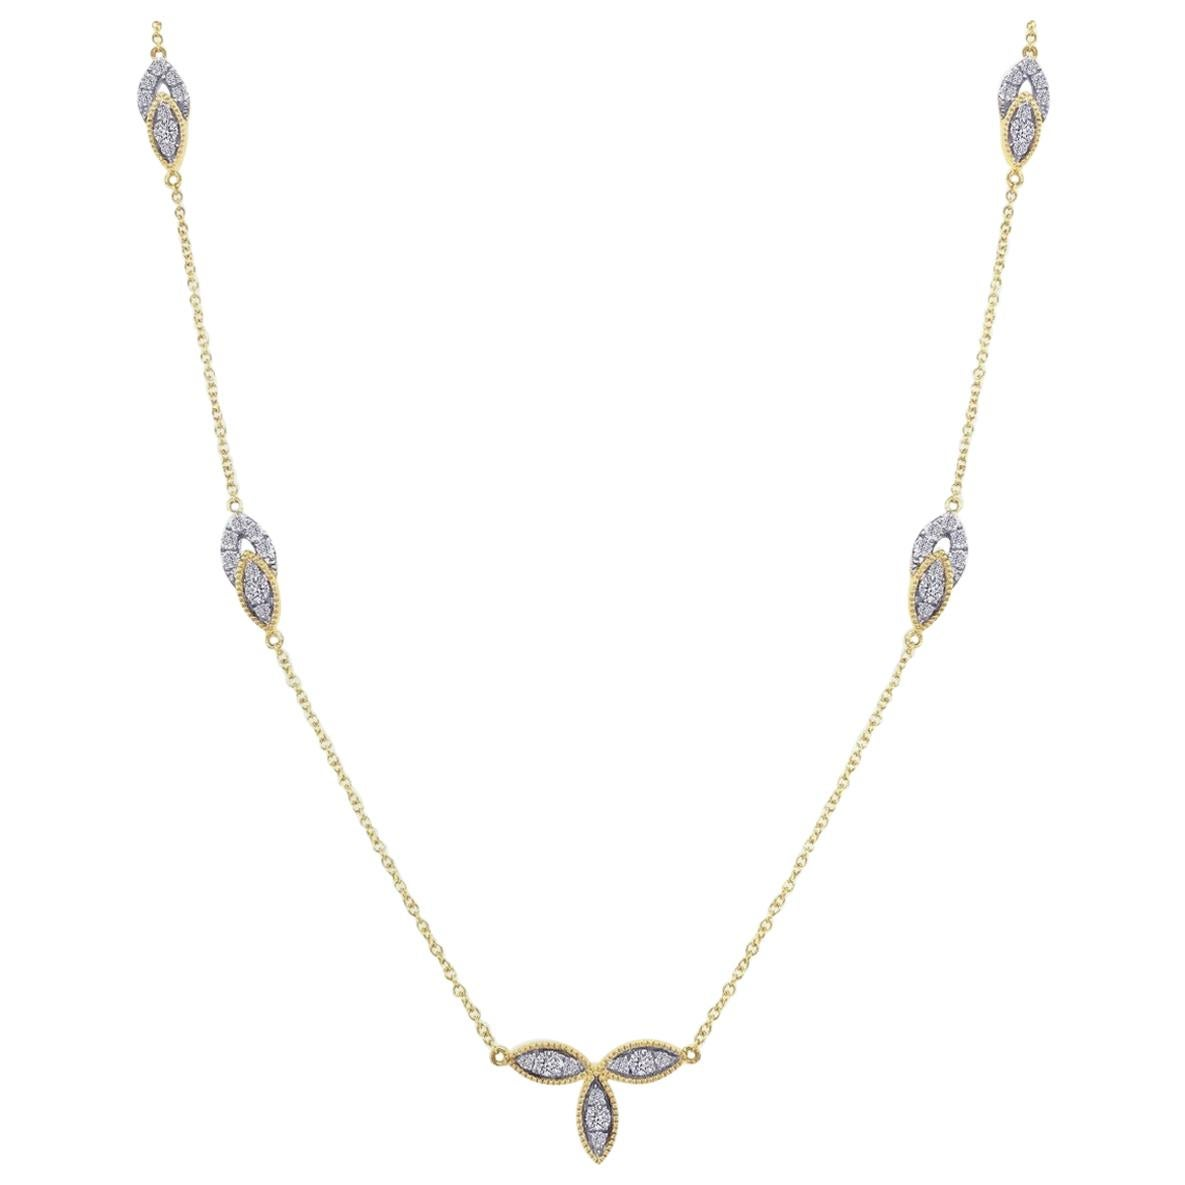 Diamond Bloom Necklace in 18 Karat Gold